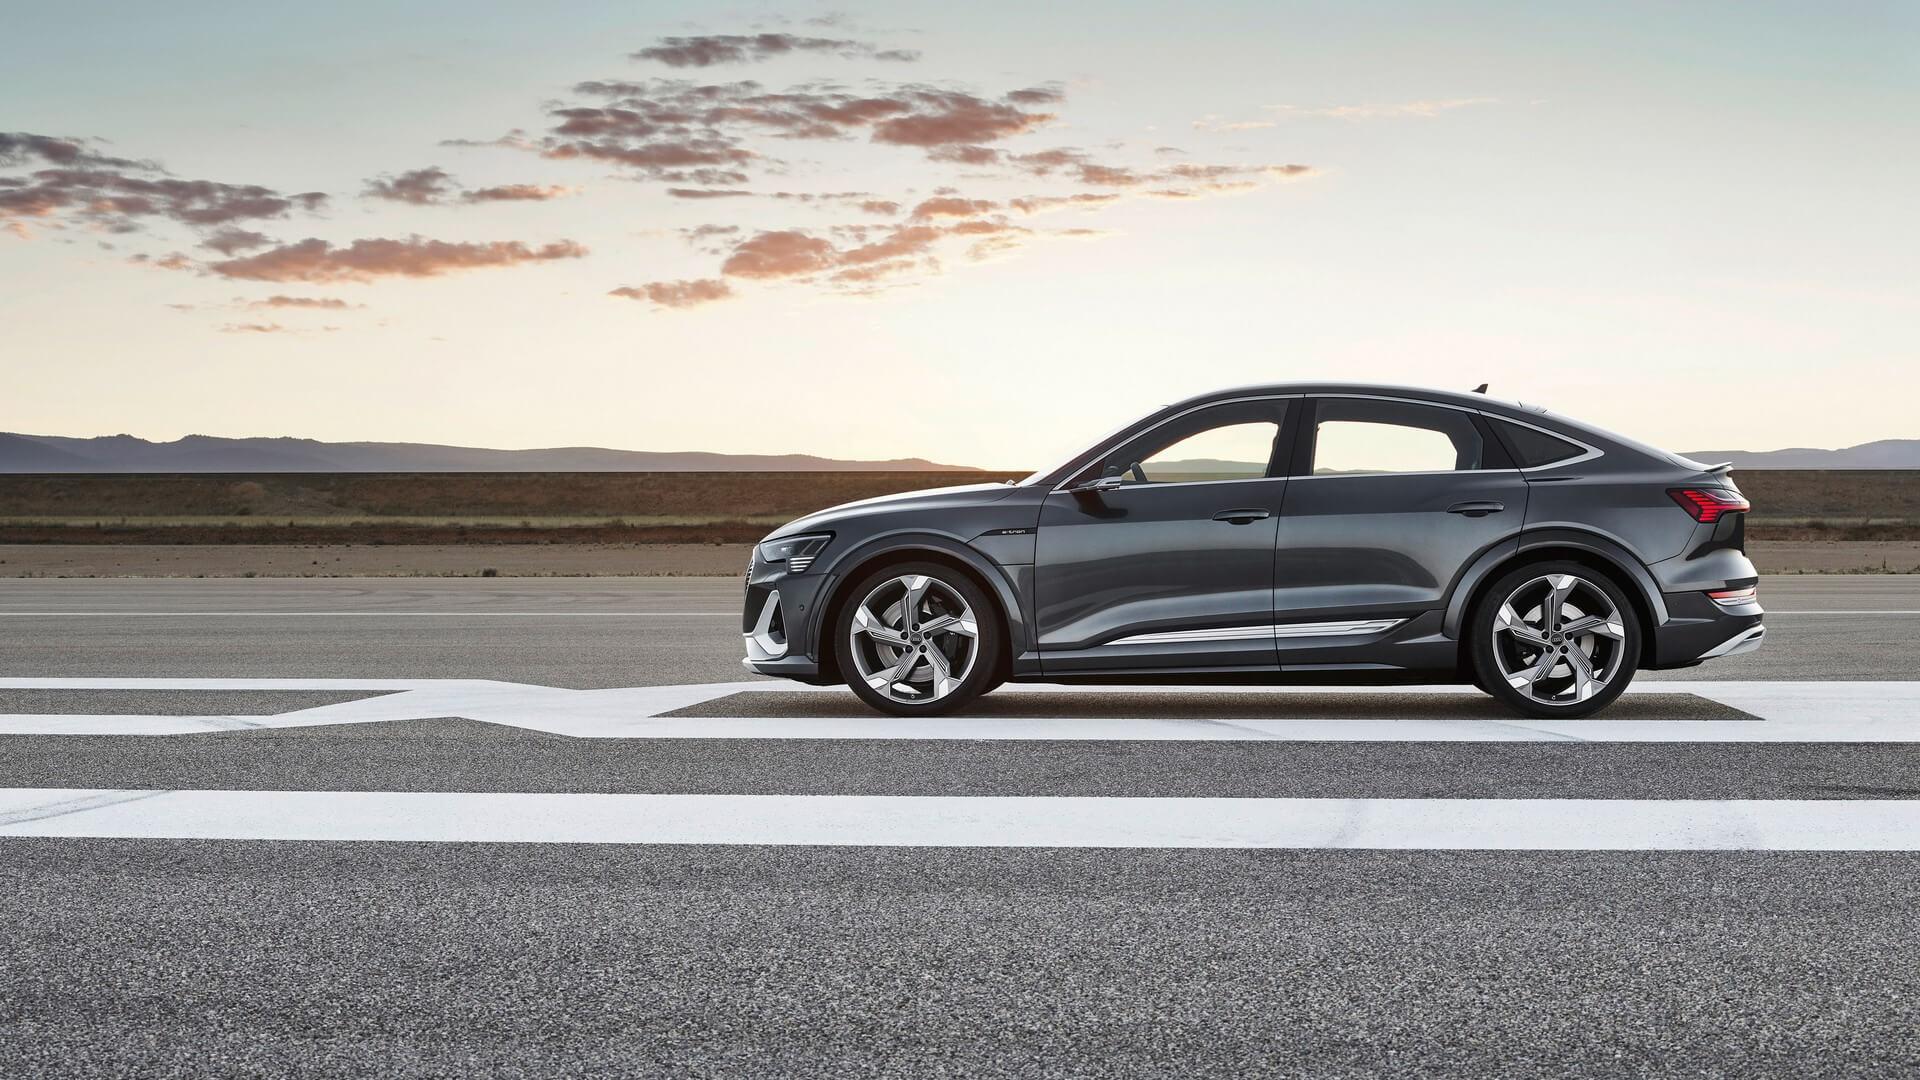 Audi-E-Tron-S-and-E-Tron-S-Sportback-2020-78